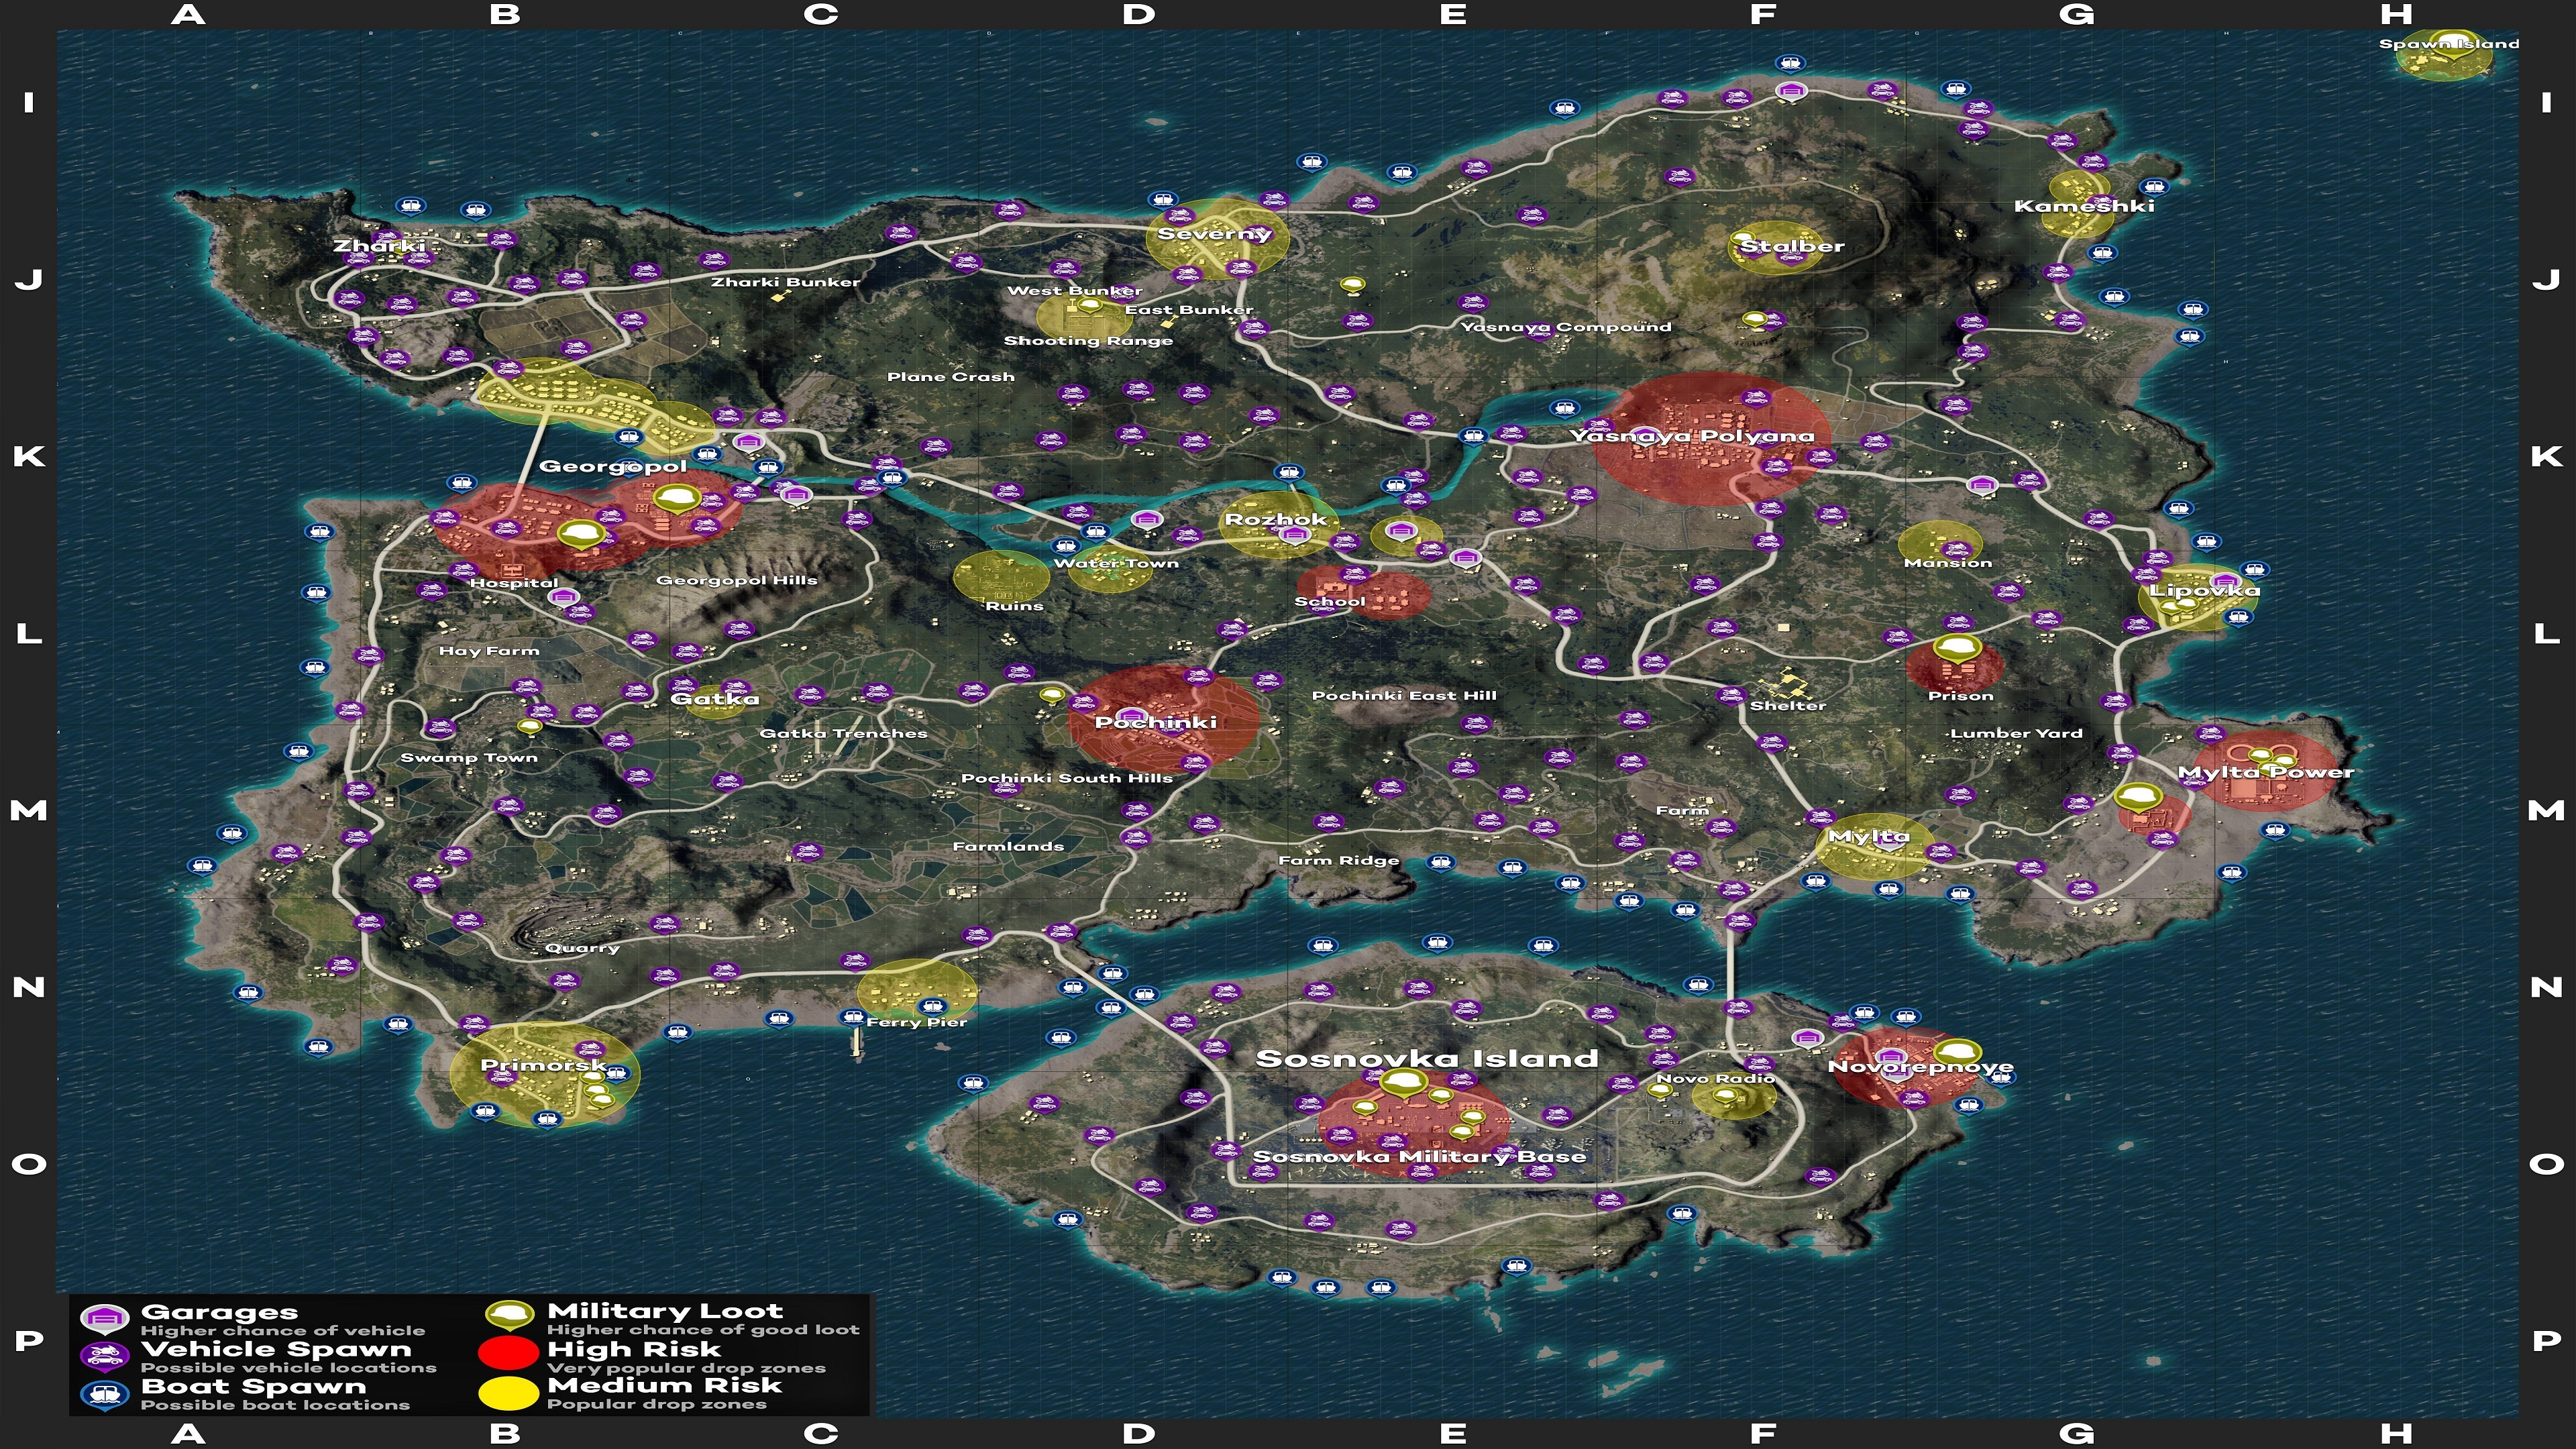 1map 1 - Pubg Loot and Car Spawn In Erangel 4K - pubg maps loot spawn 4k 2019, pubg loot spawn maps hd 4k, PUBG loot maps erangel 4k hd, Pubg Loot and Car Spawn In Erangel 4K